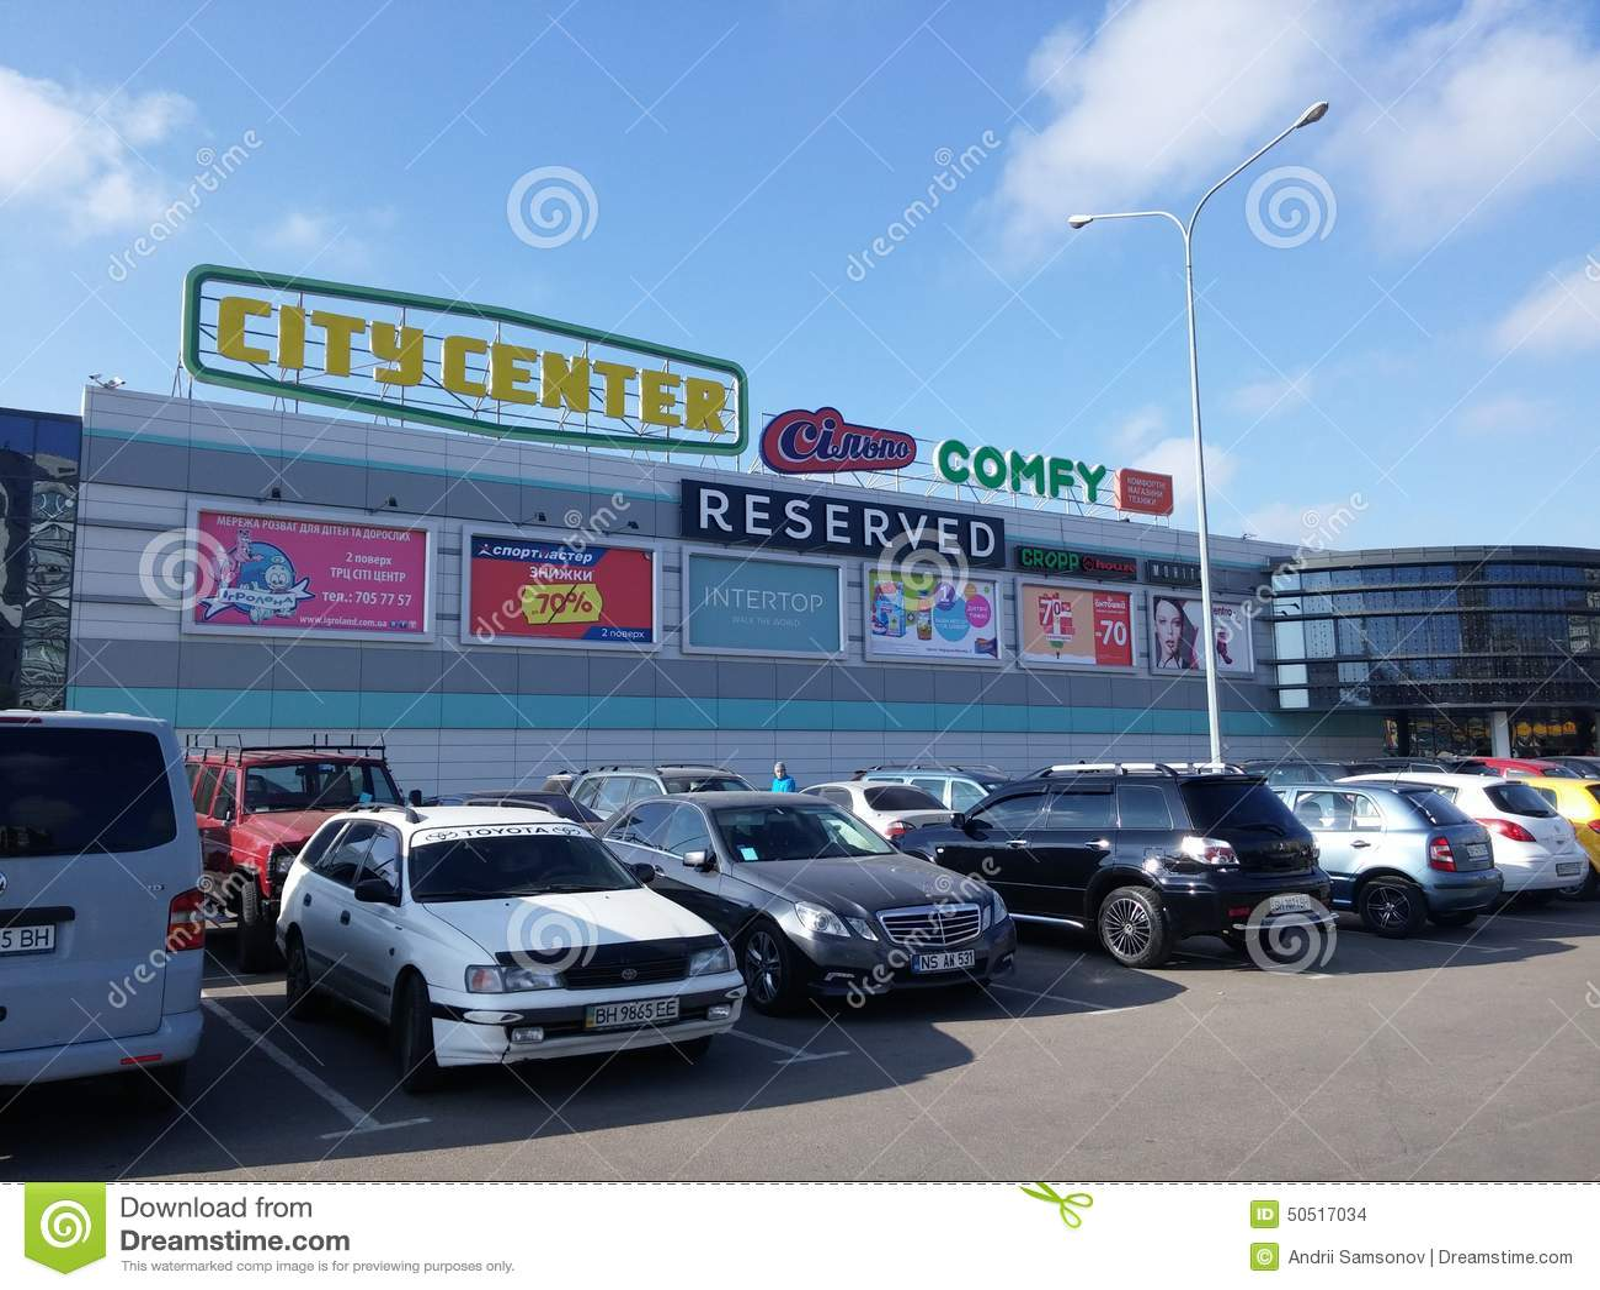 City Center Mall Odessa Ukraine